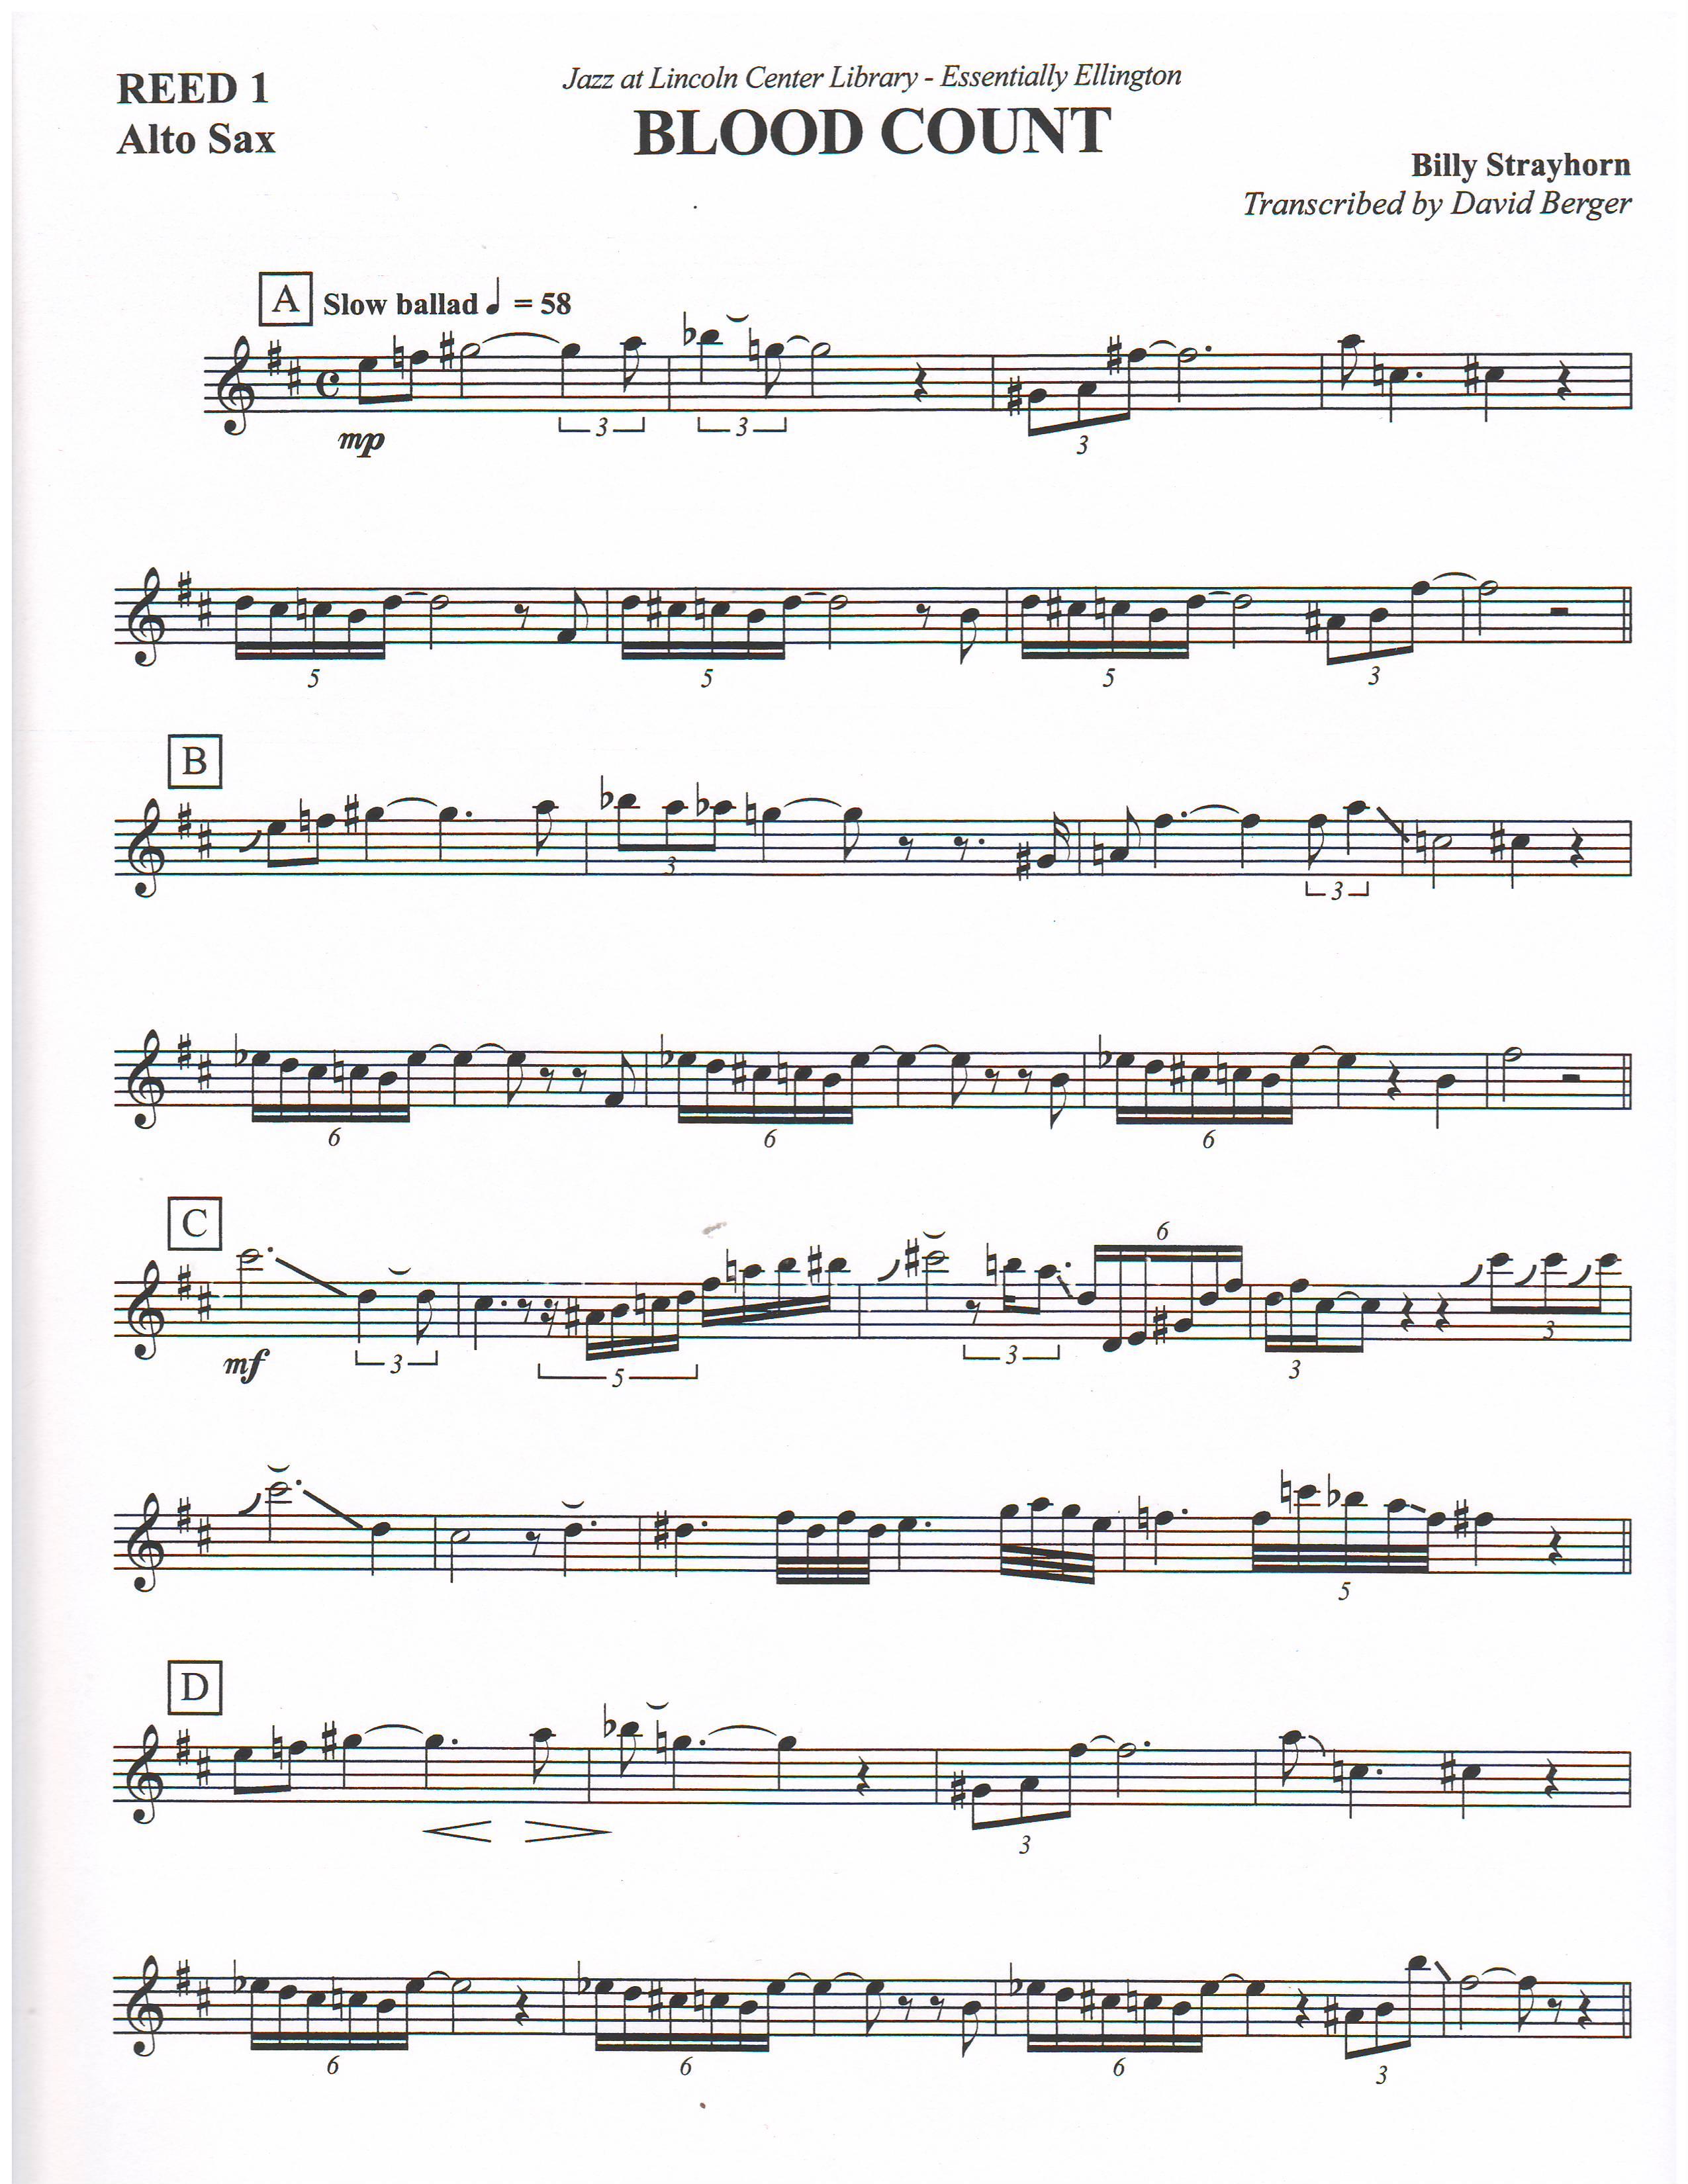 BLOOD COUNT - By Composer / Performer, Ellington, Duke, Jazz